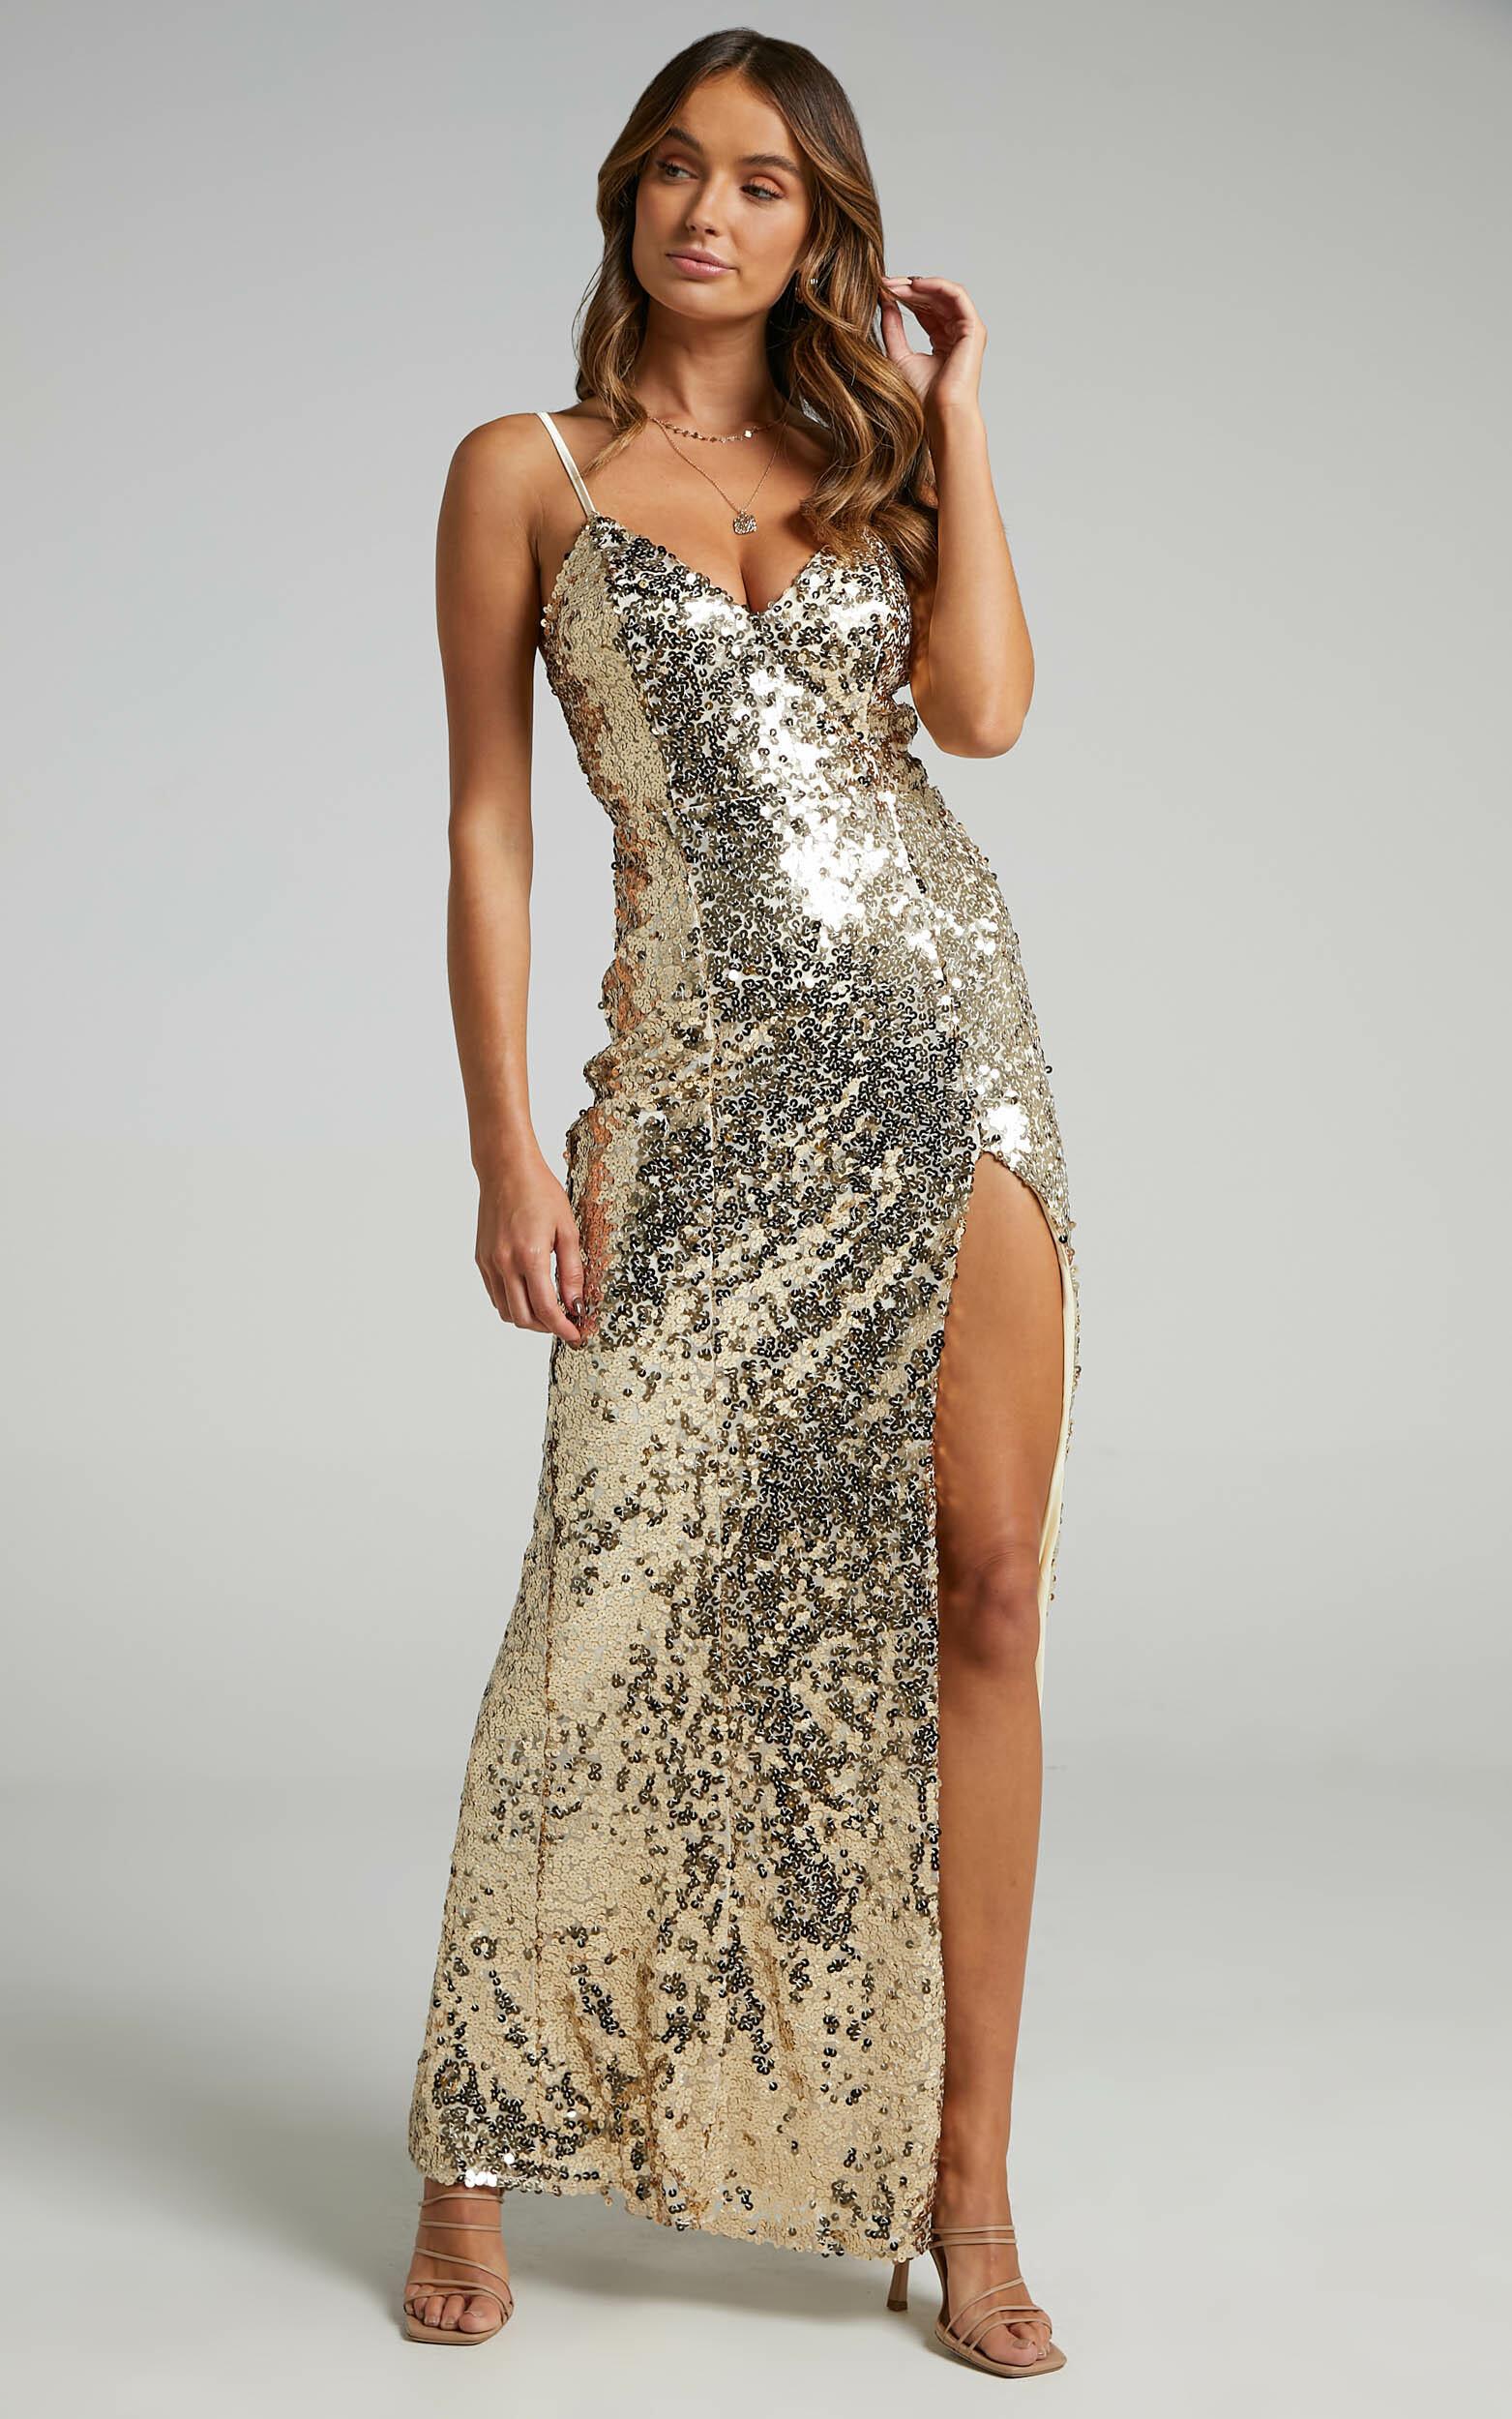 Mikela Dress in Gold Sequin - 06, GLD2, hi-res image number null